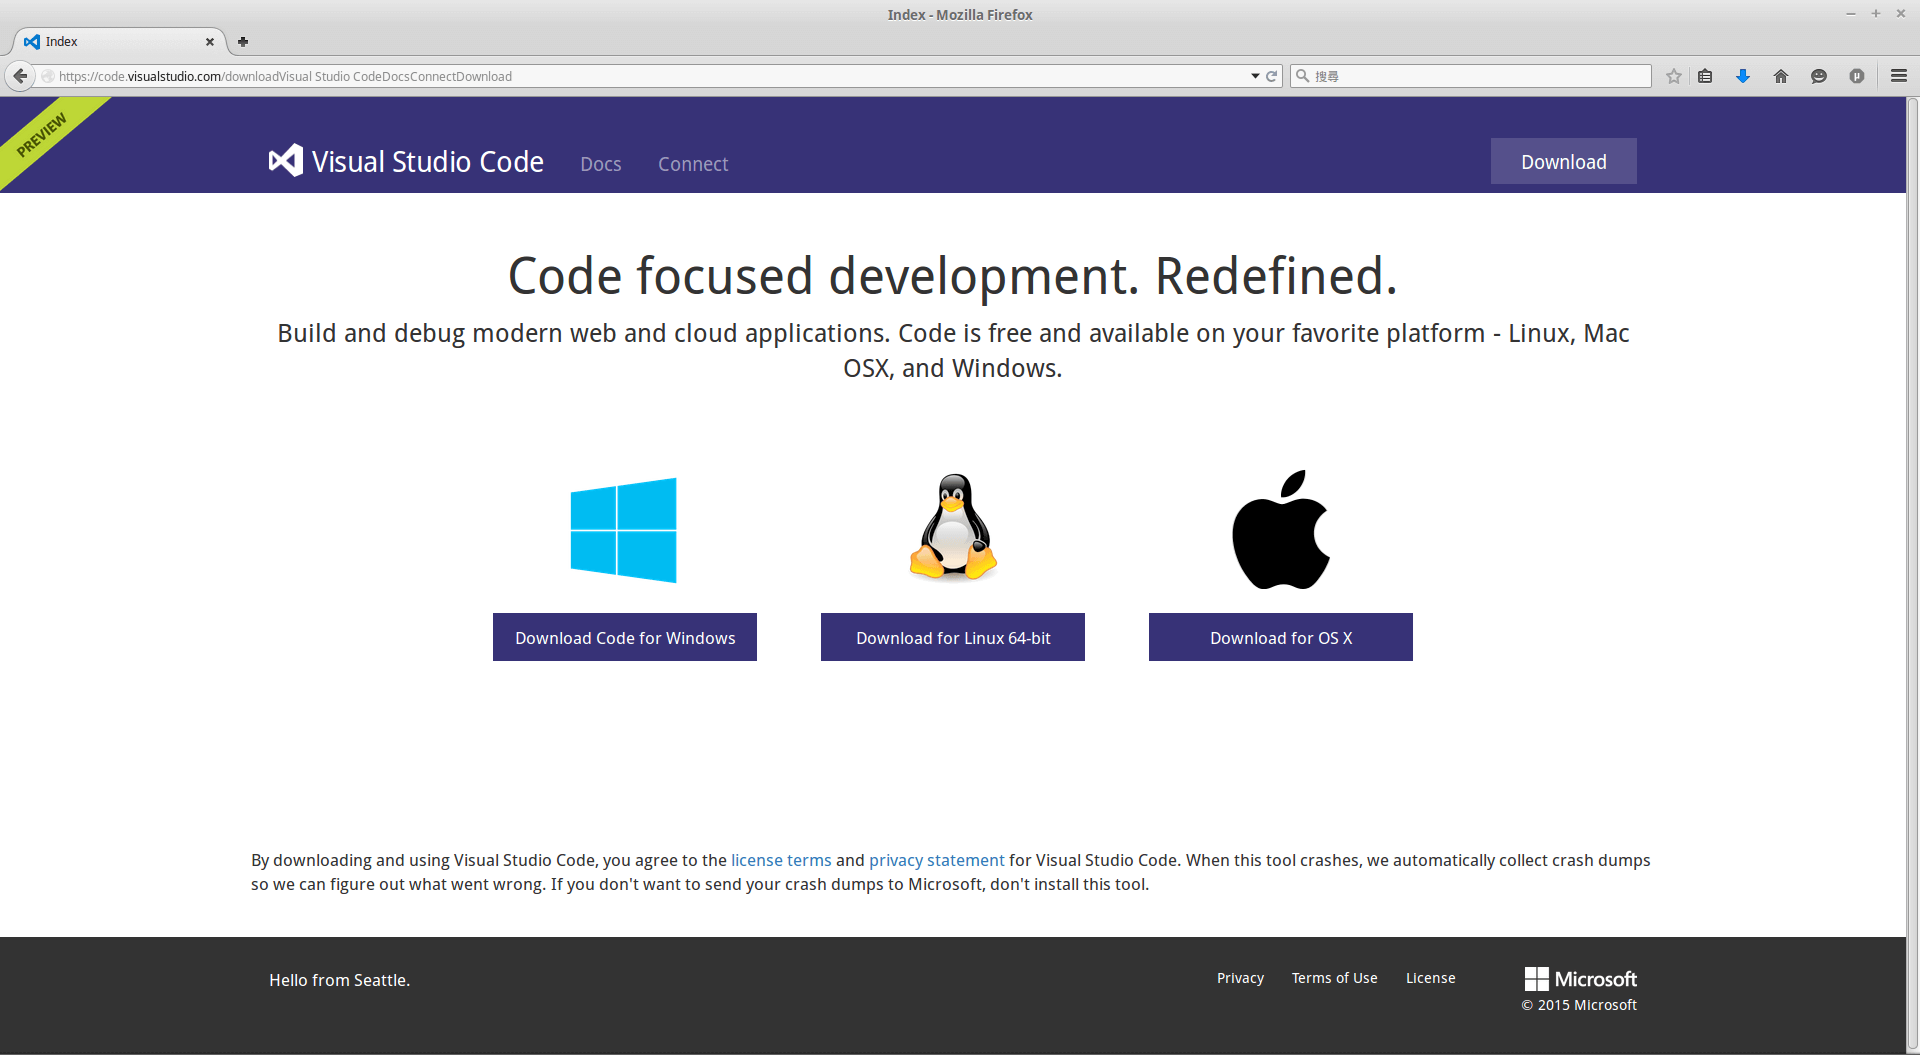 MicrosoftVisualStudioCodePreviewWebsite